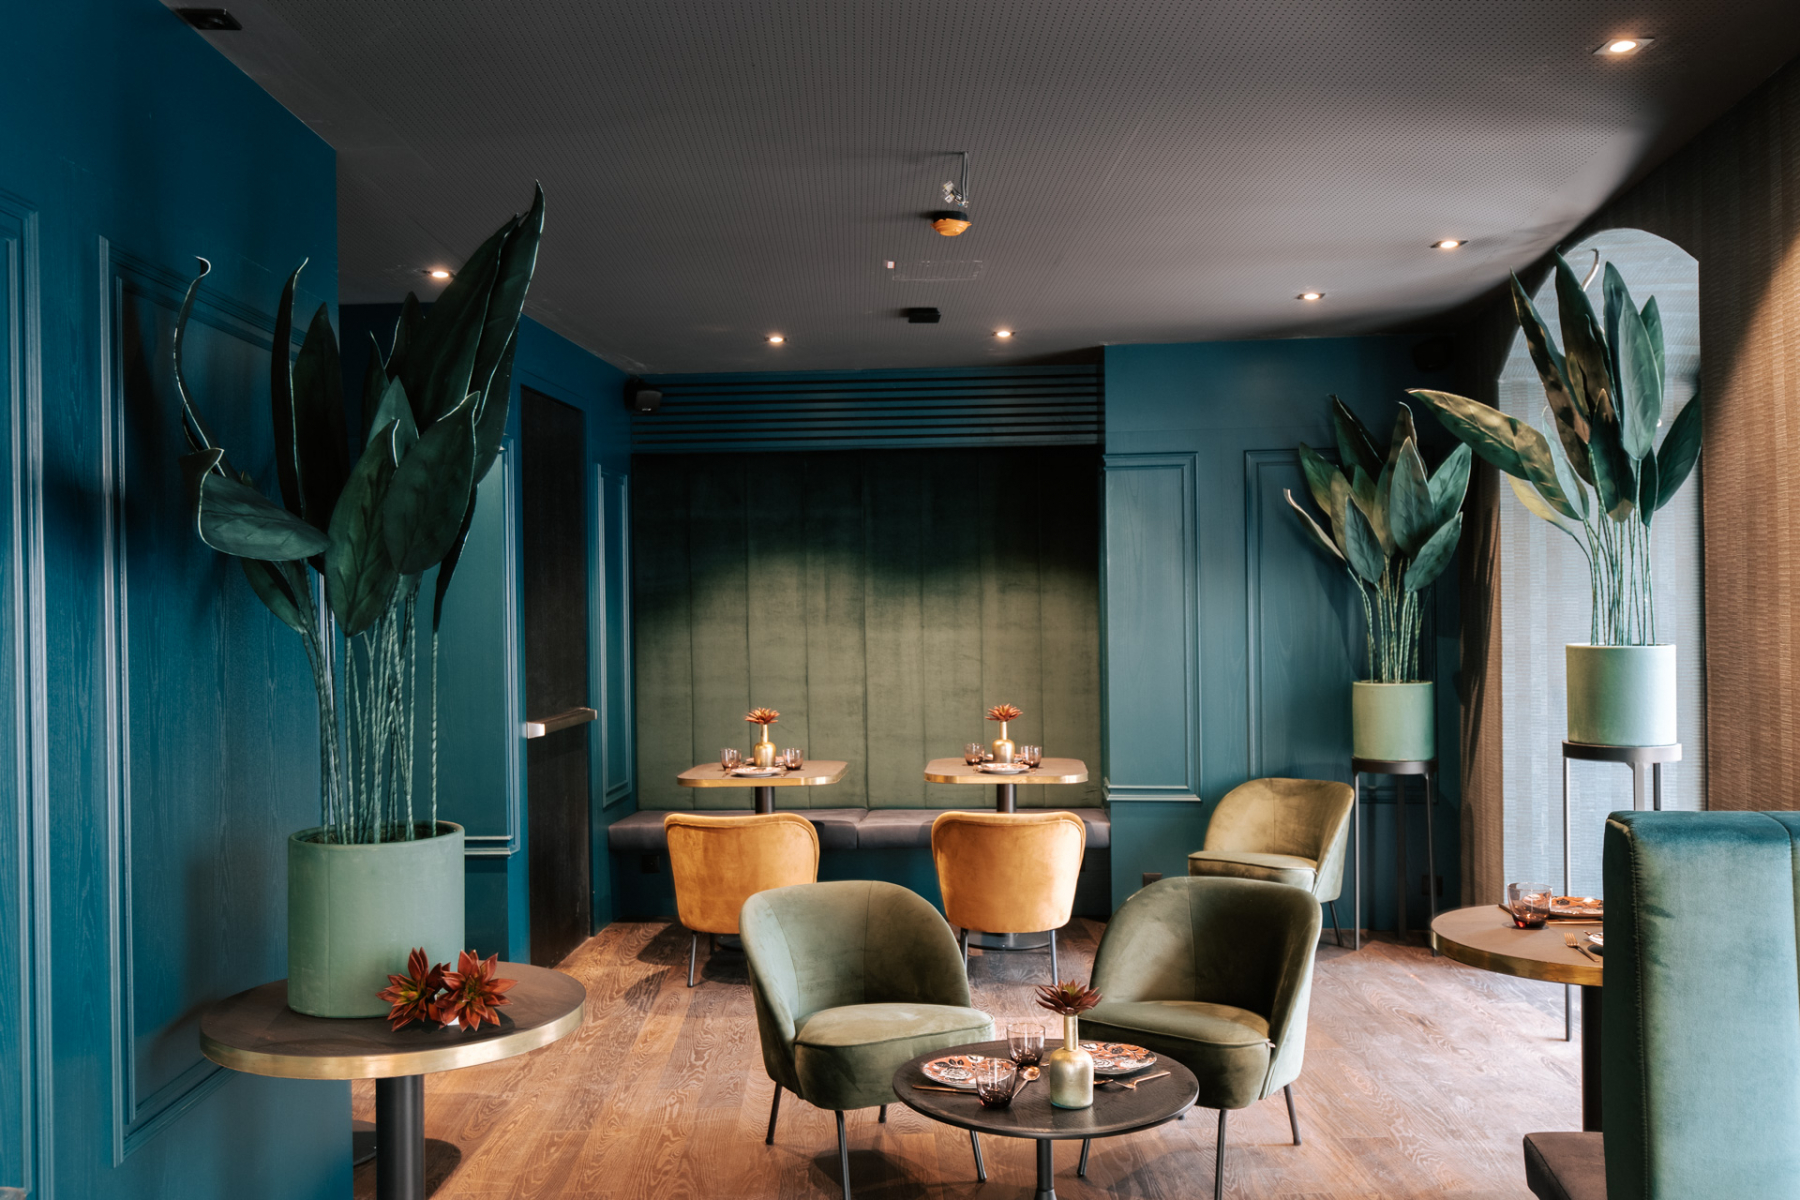 AIOLA LIVING Hotel & Store © Paul Bauer